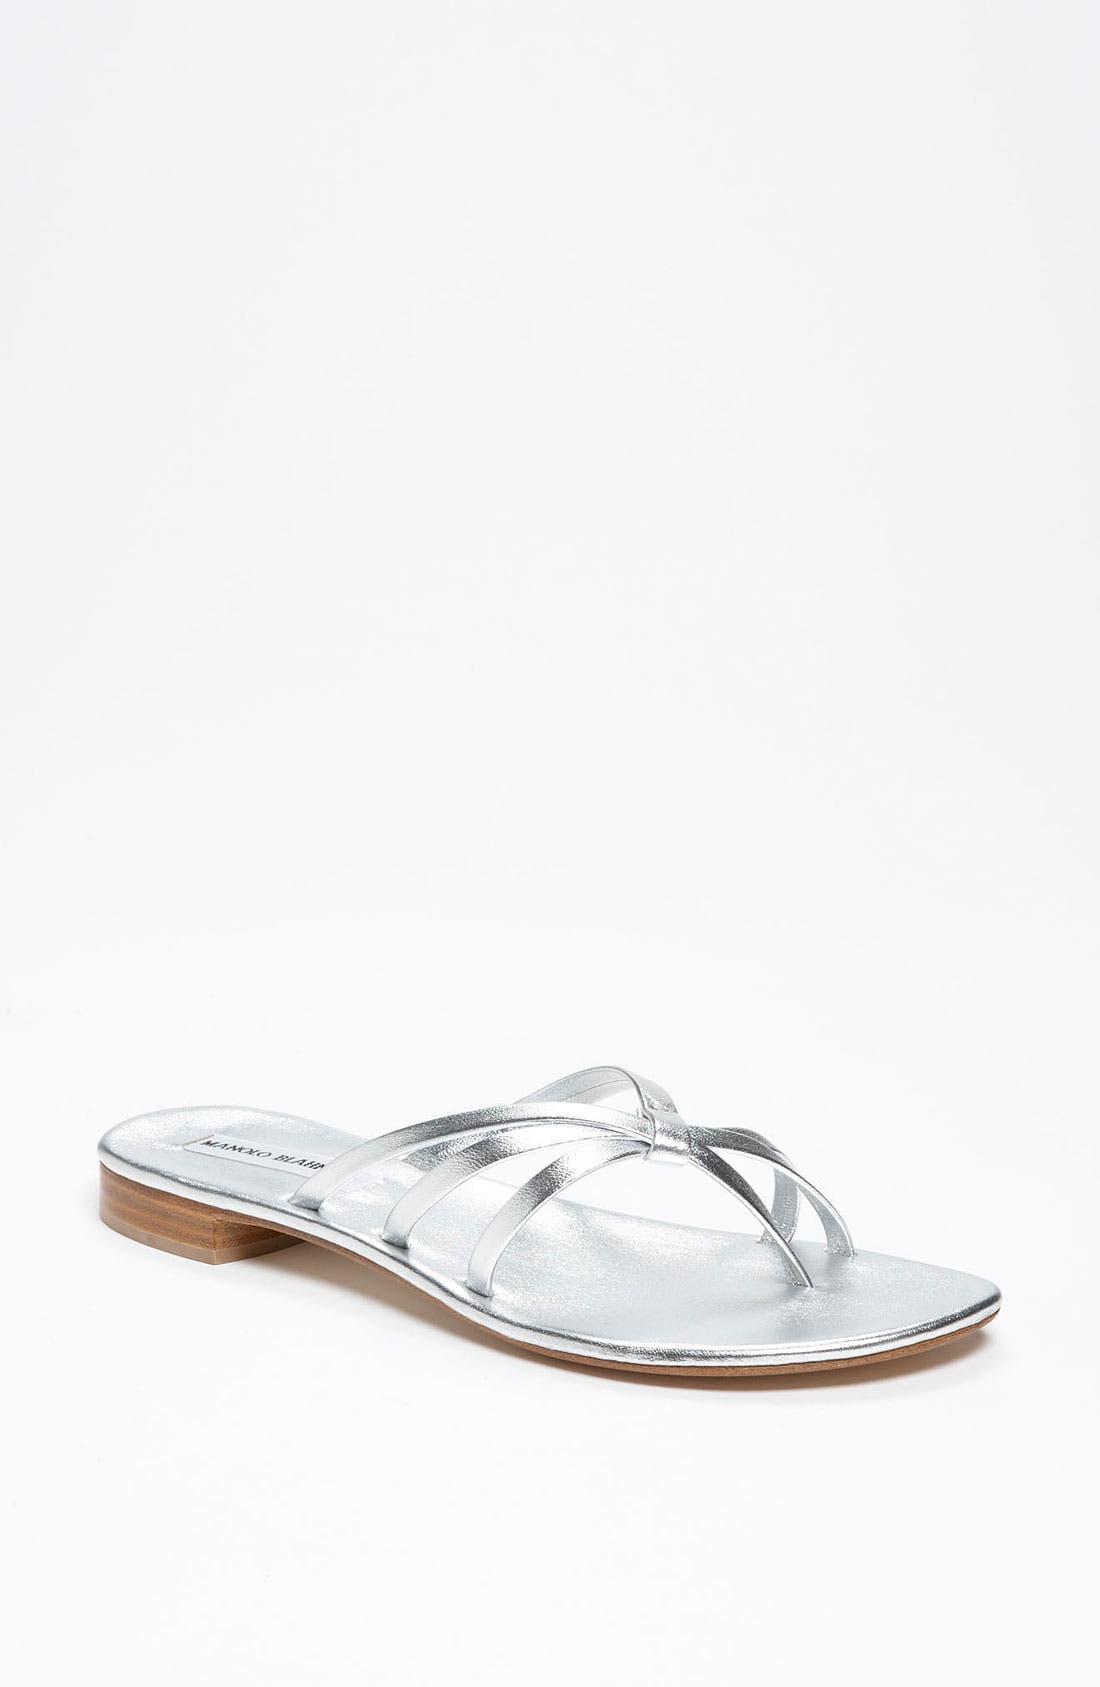 Alternate Image 1 Selected - Manolo Blahnik 'Winddoka' Sandal